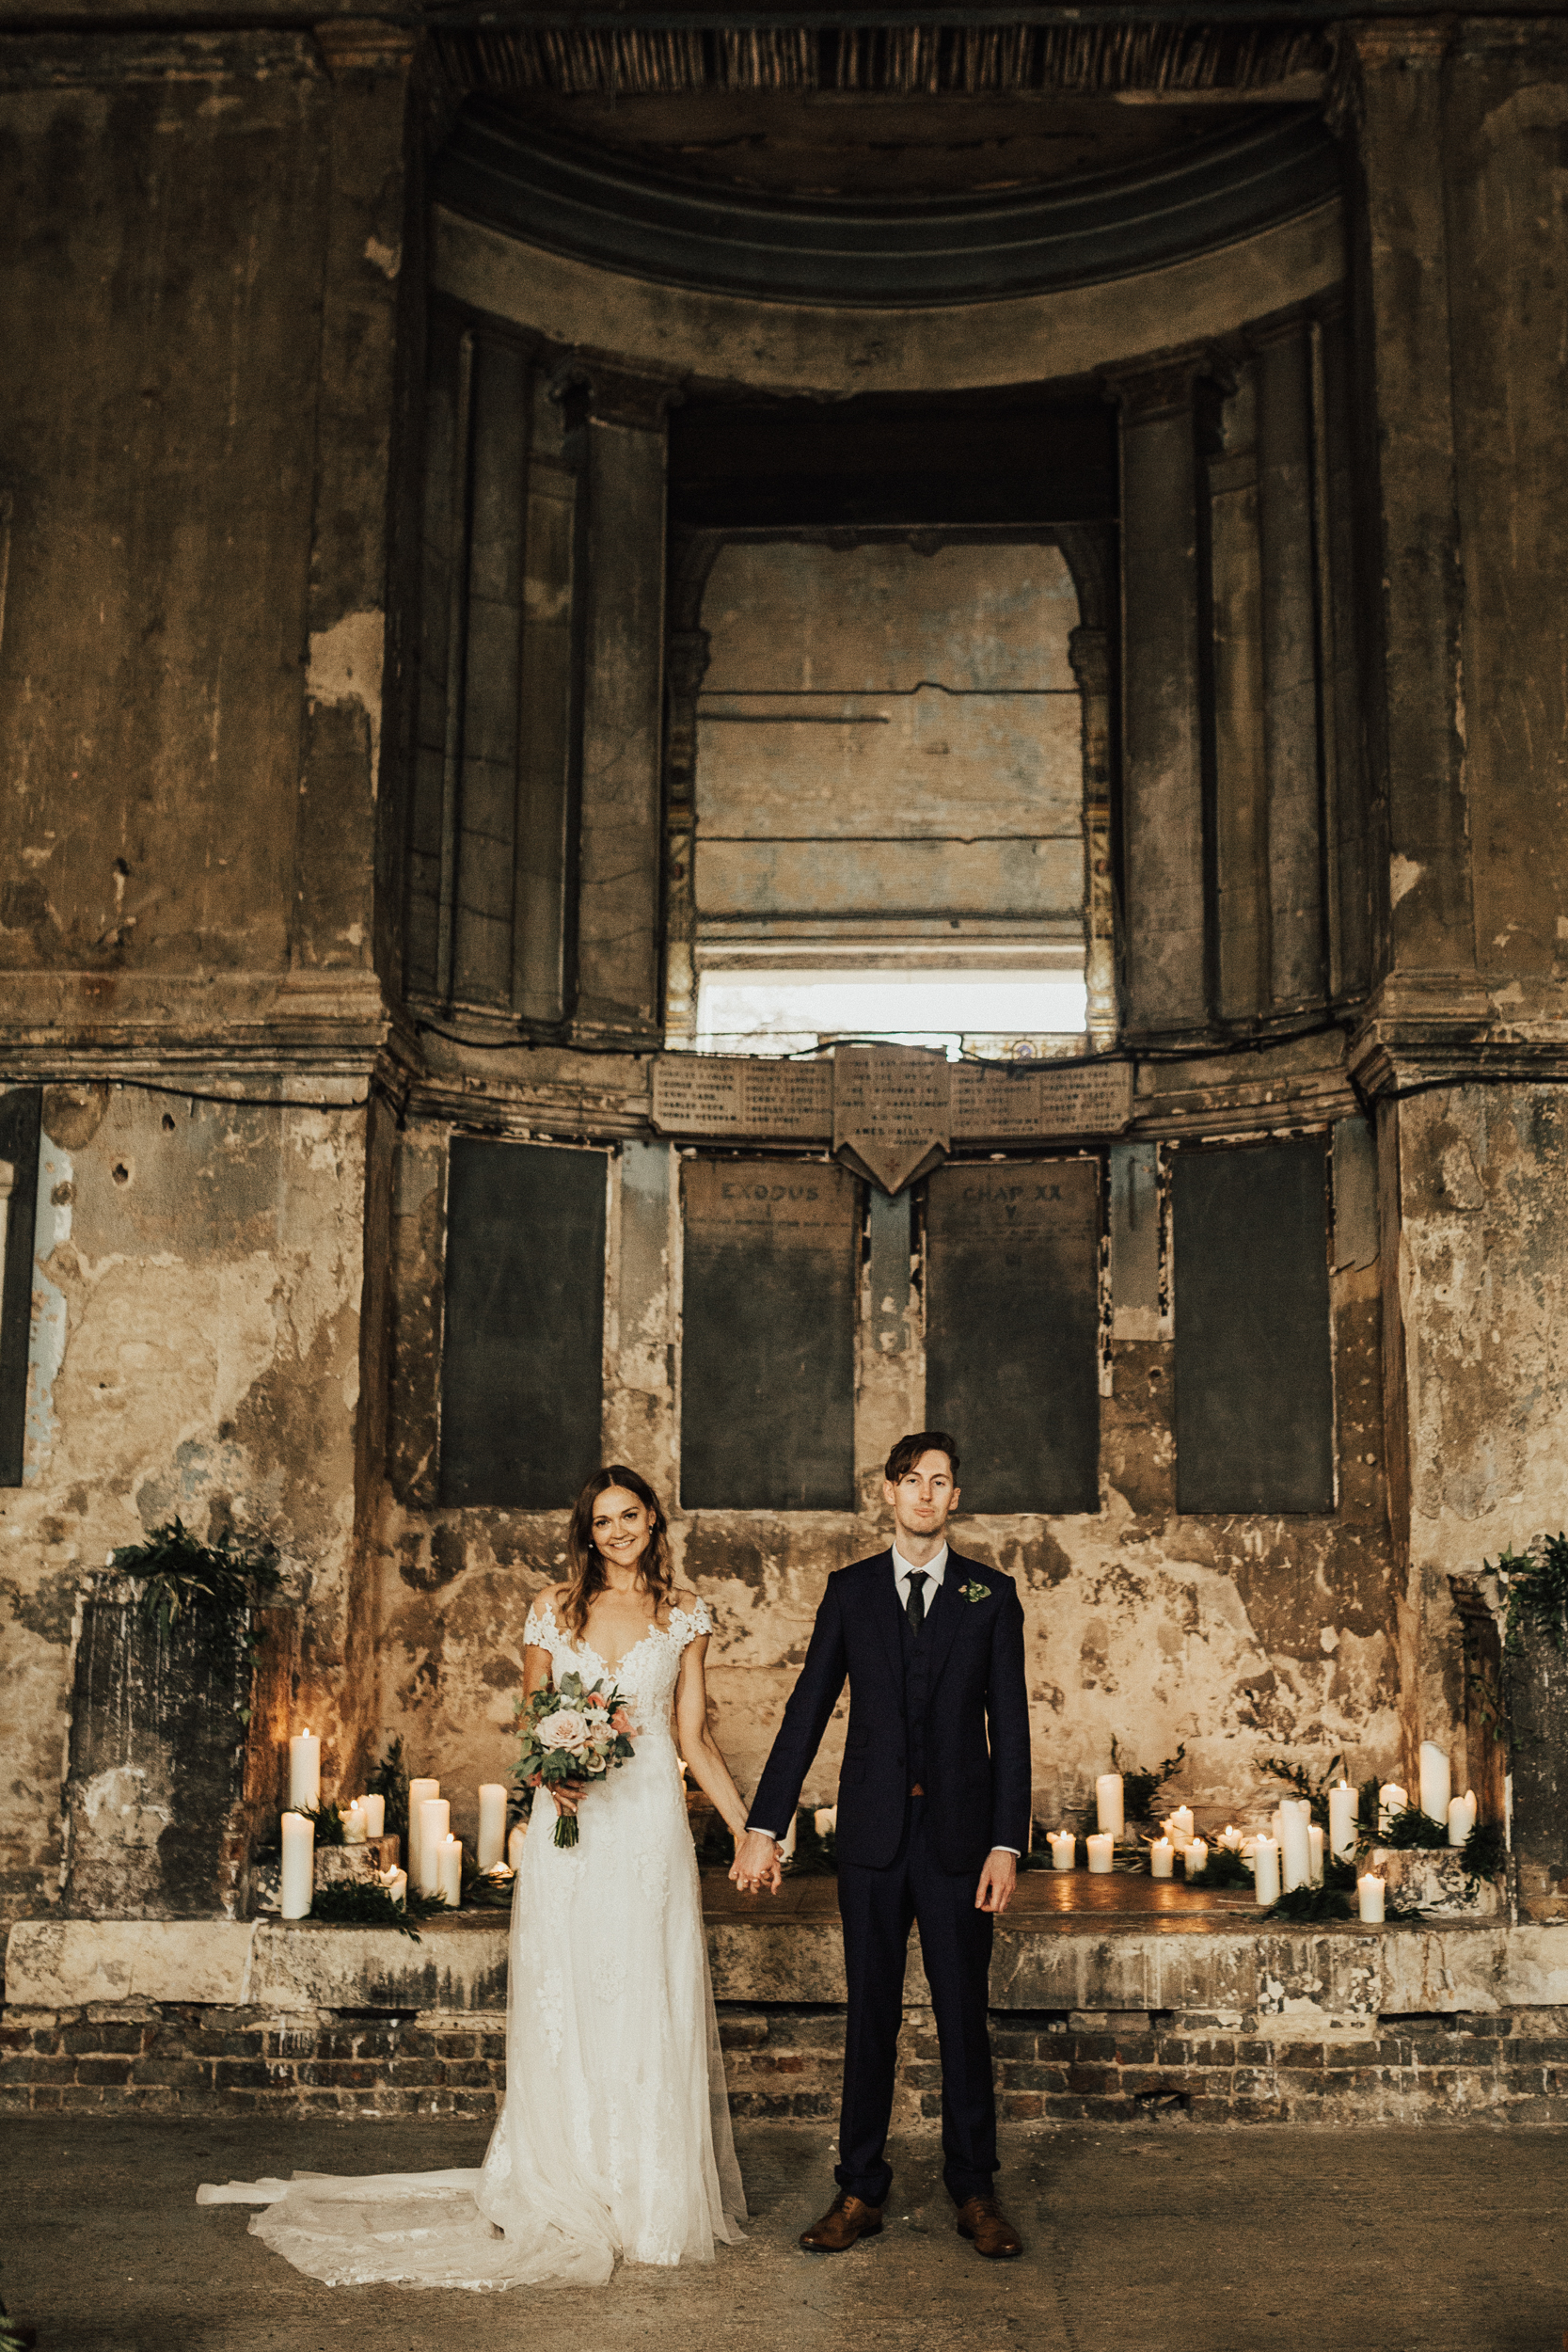 Laura-Benn-The-Asylum-London-The-Ace-Hotel-Wedding-Alternative-Darina-Stoda-Photography-363.jpg